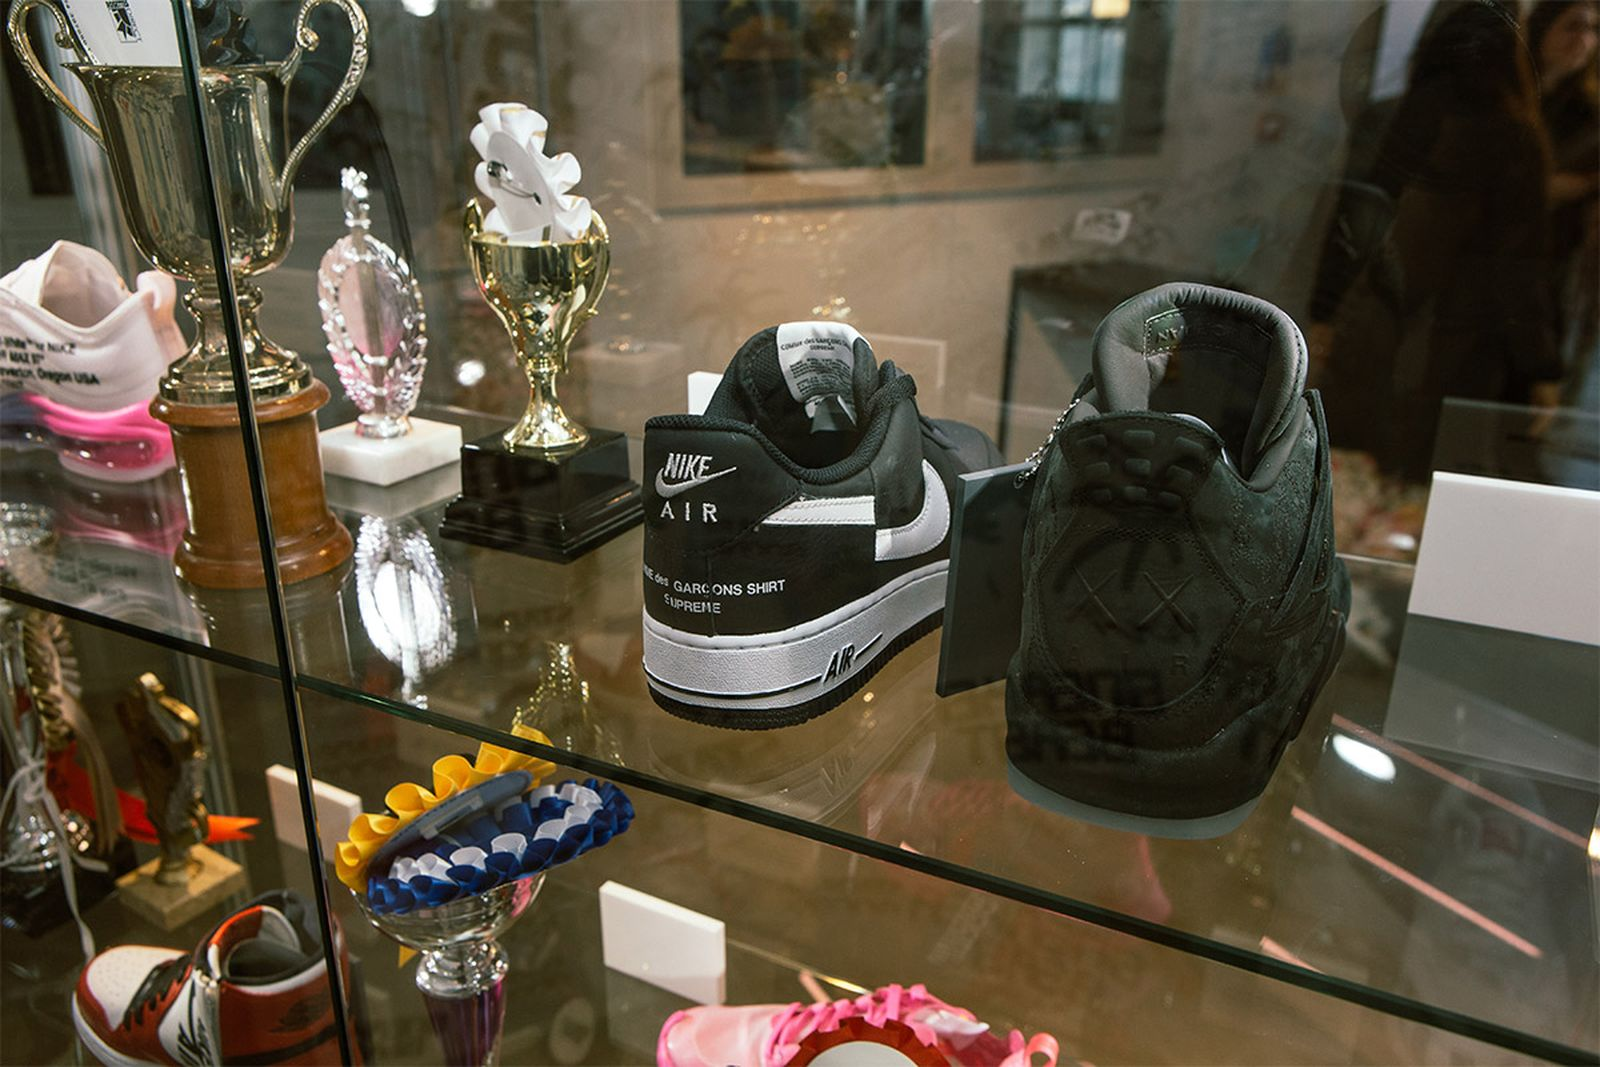 browns stadium goods sneaker beast launch browns east chinatown market clothsurgeon